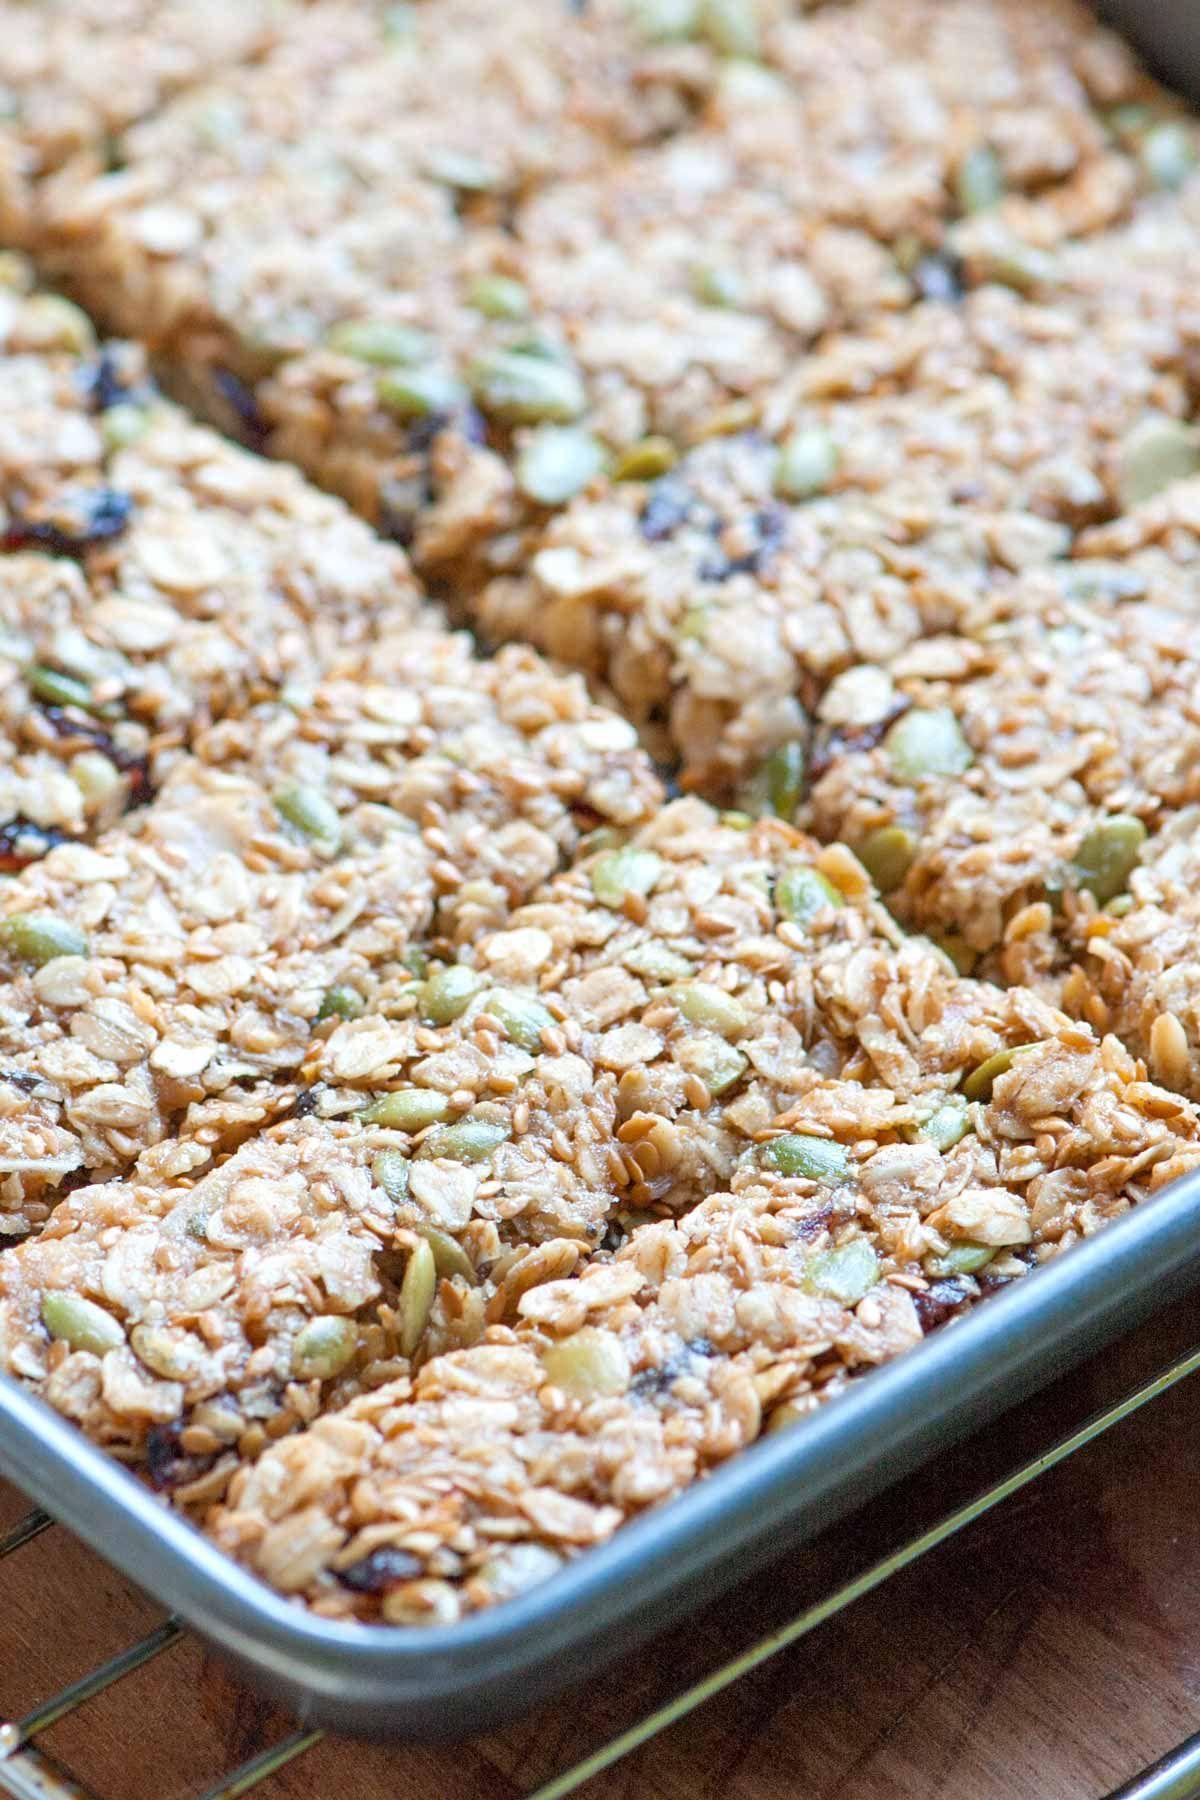 Homemade Baked Granola Bars | Recipe in 2020 | No bake ...